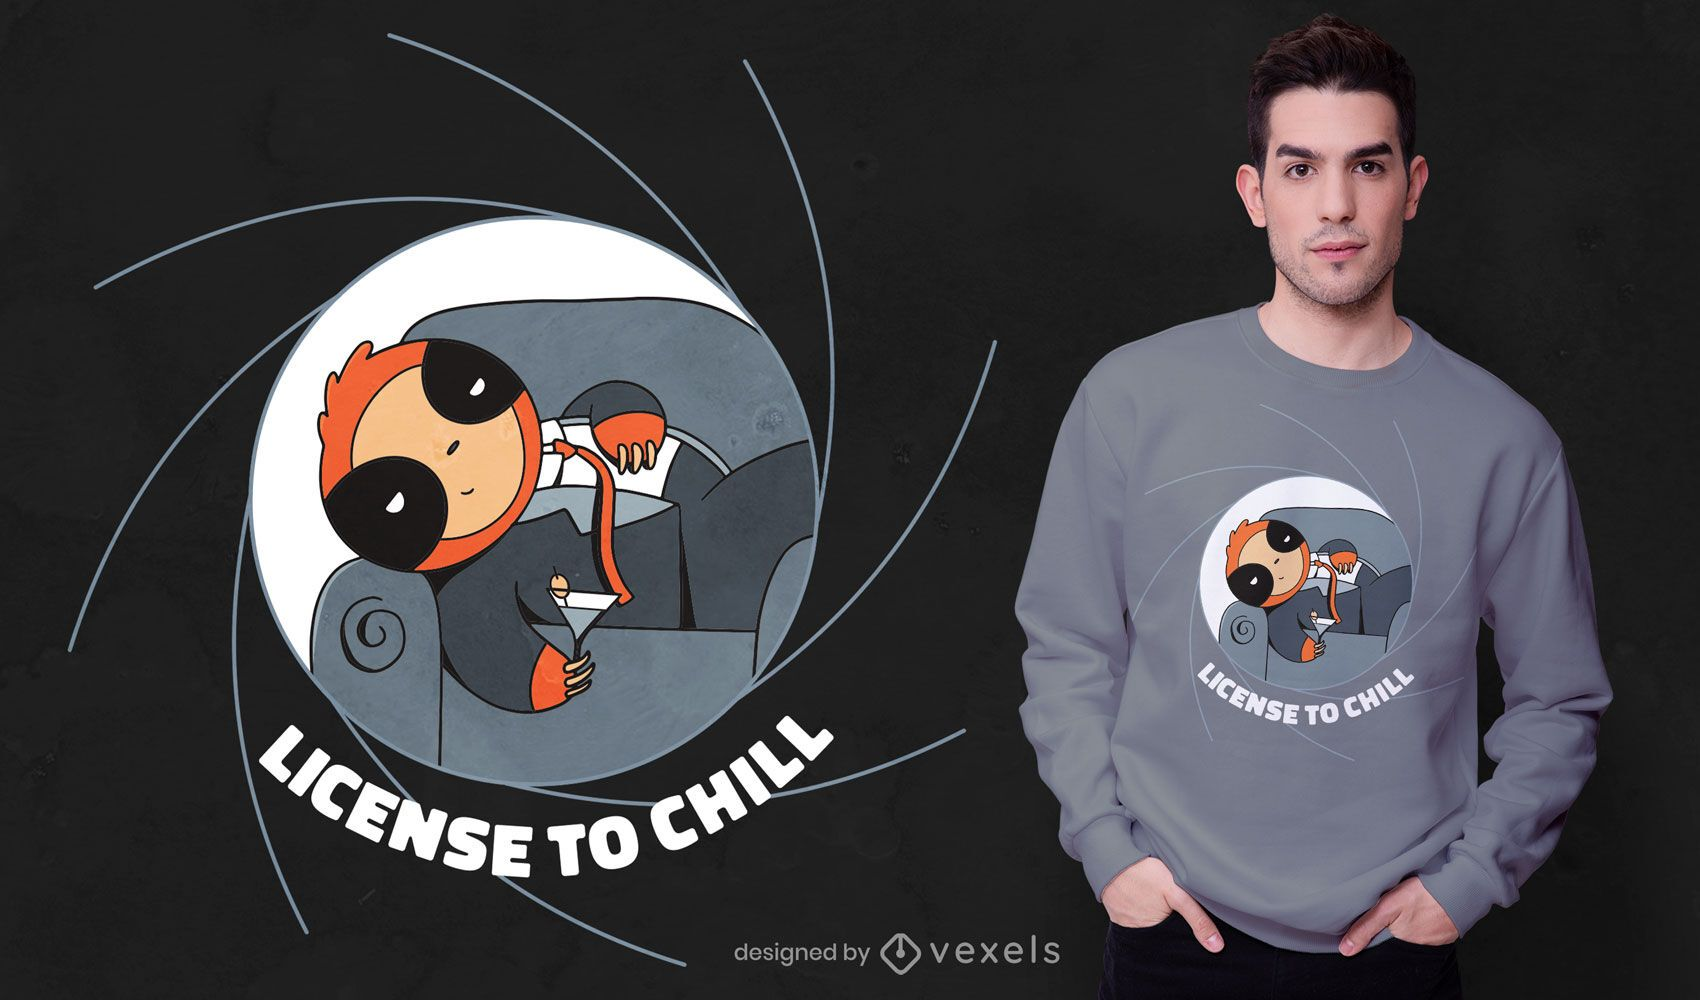 Chill sloth t-shirt design